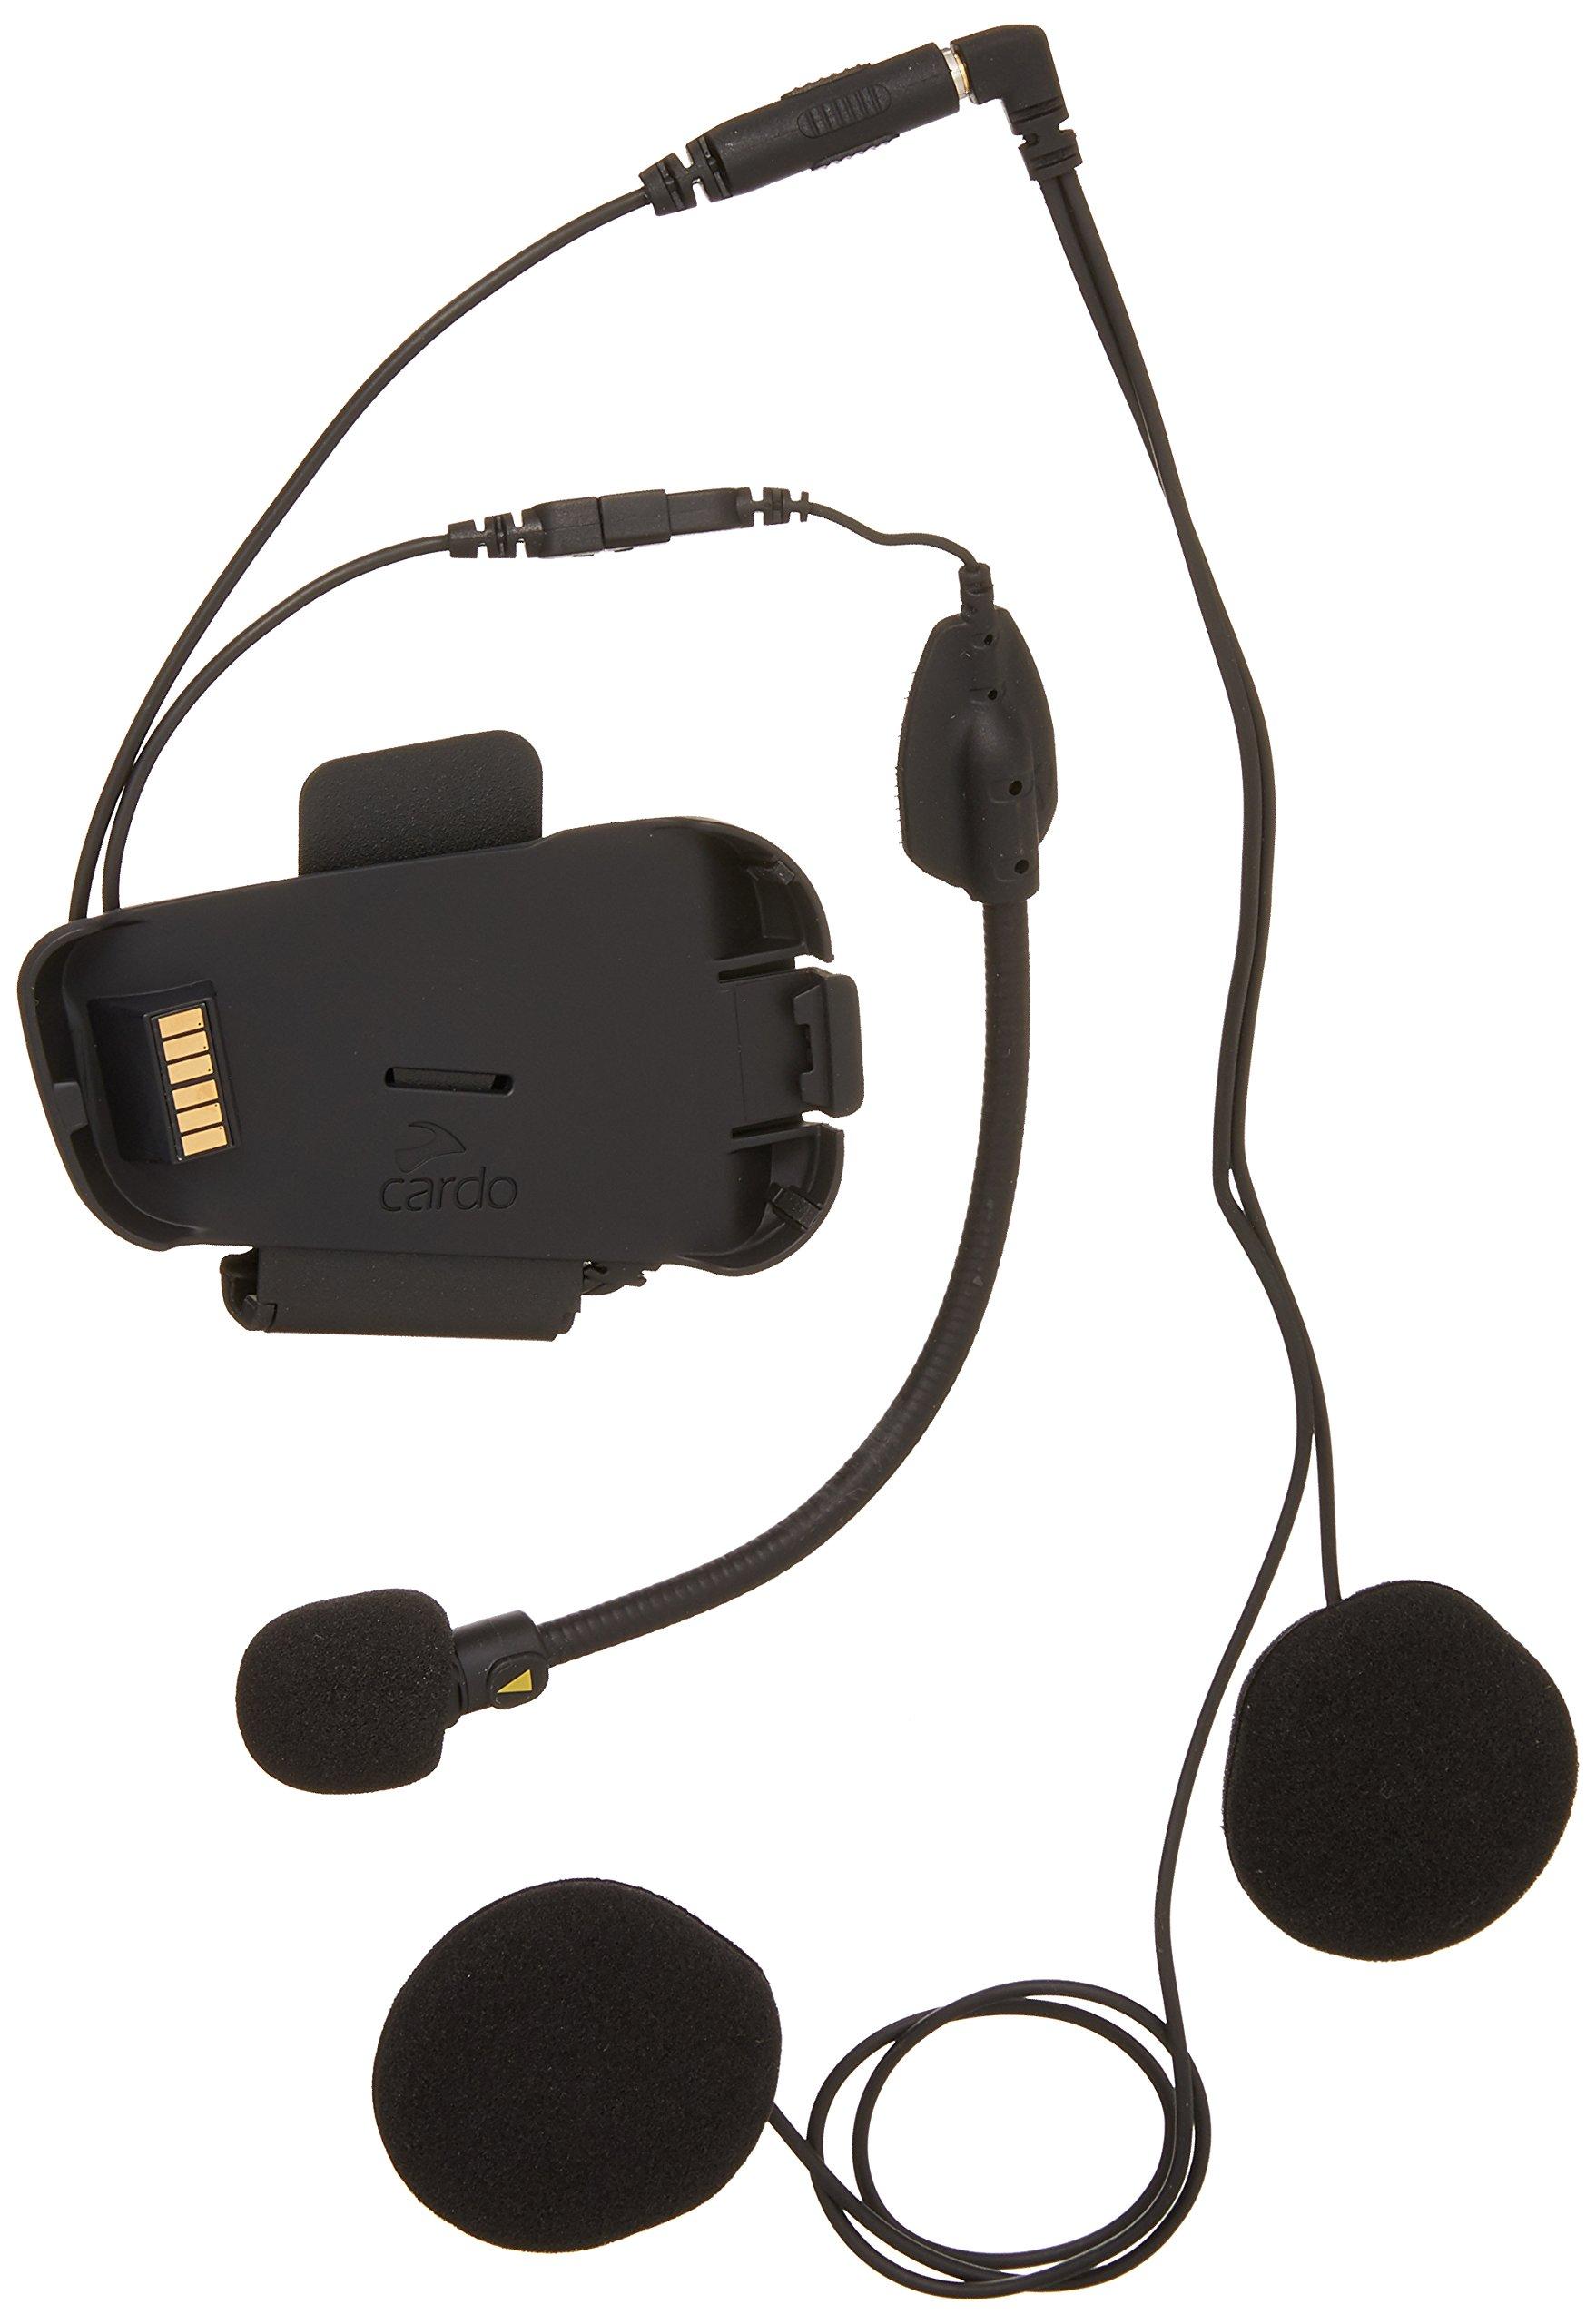 Cardo scala rider SRAK0033 Packtalk/Smartpack Audio & Microphone Kit